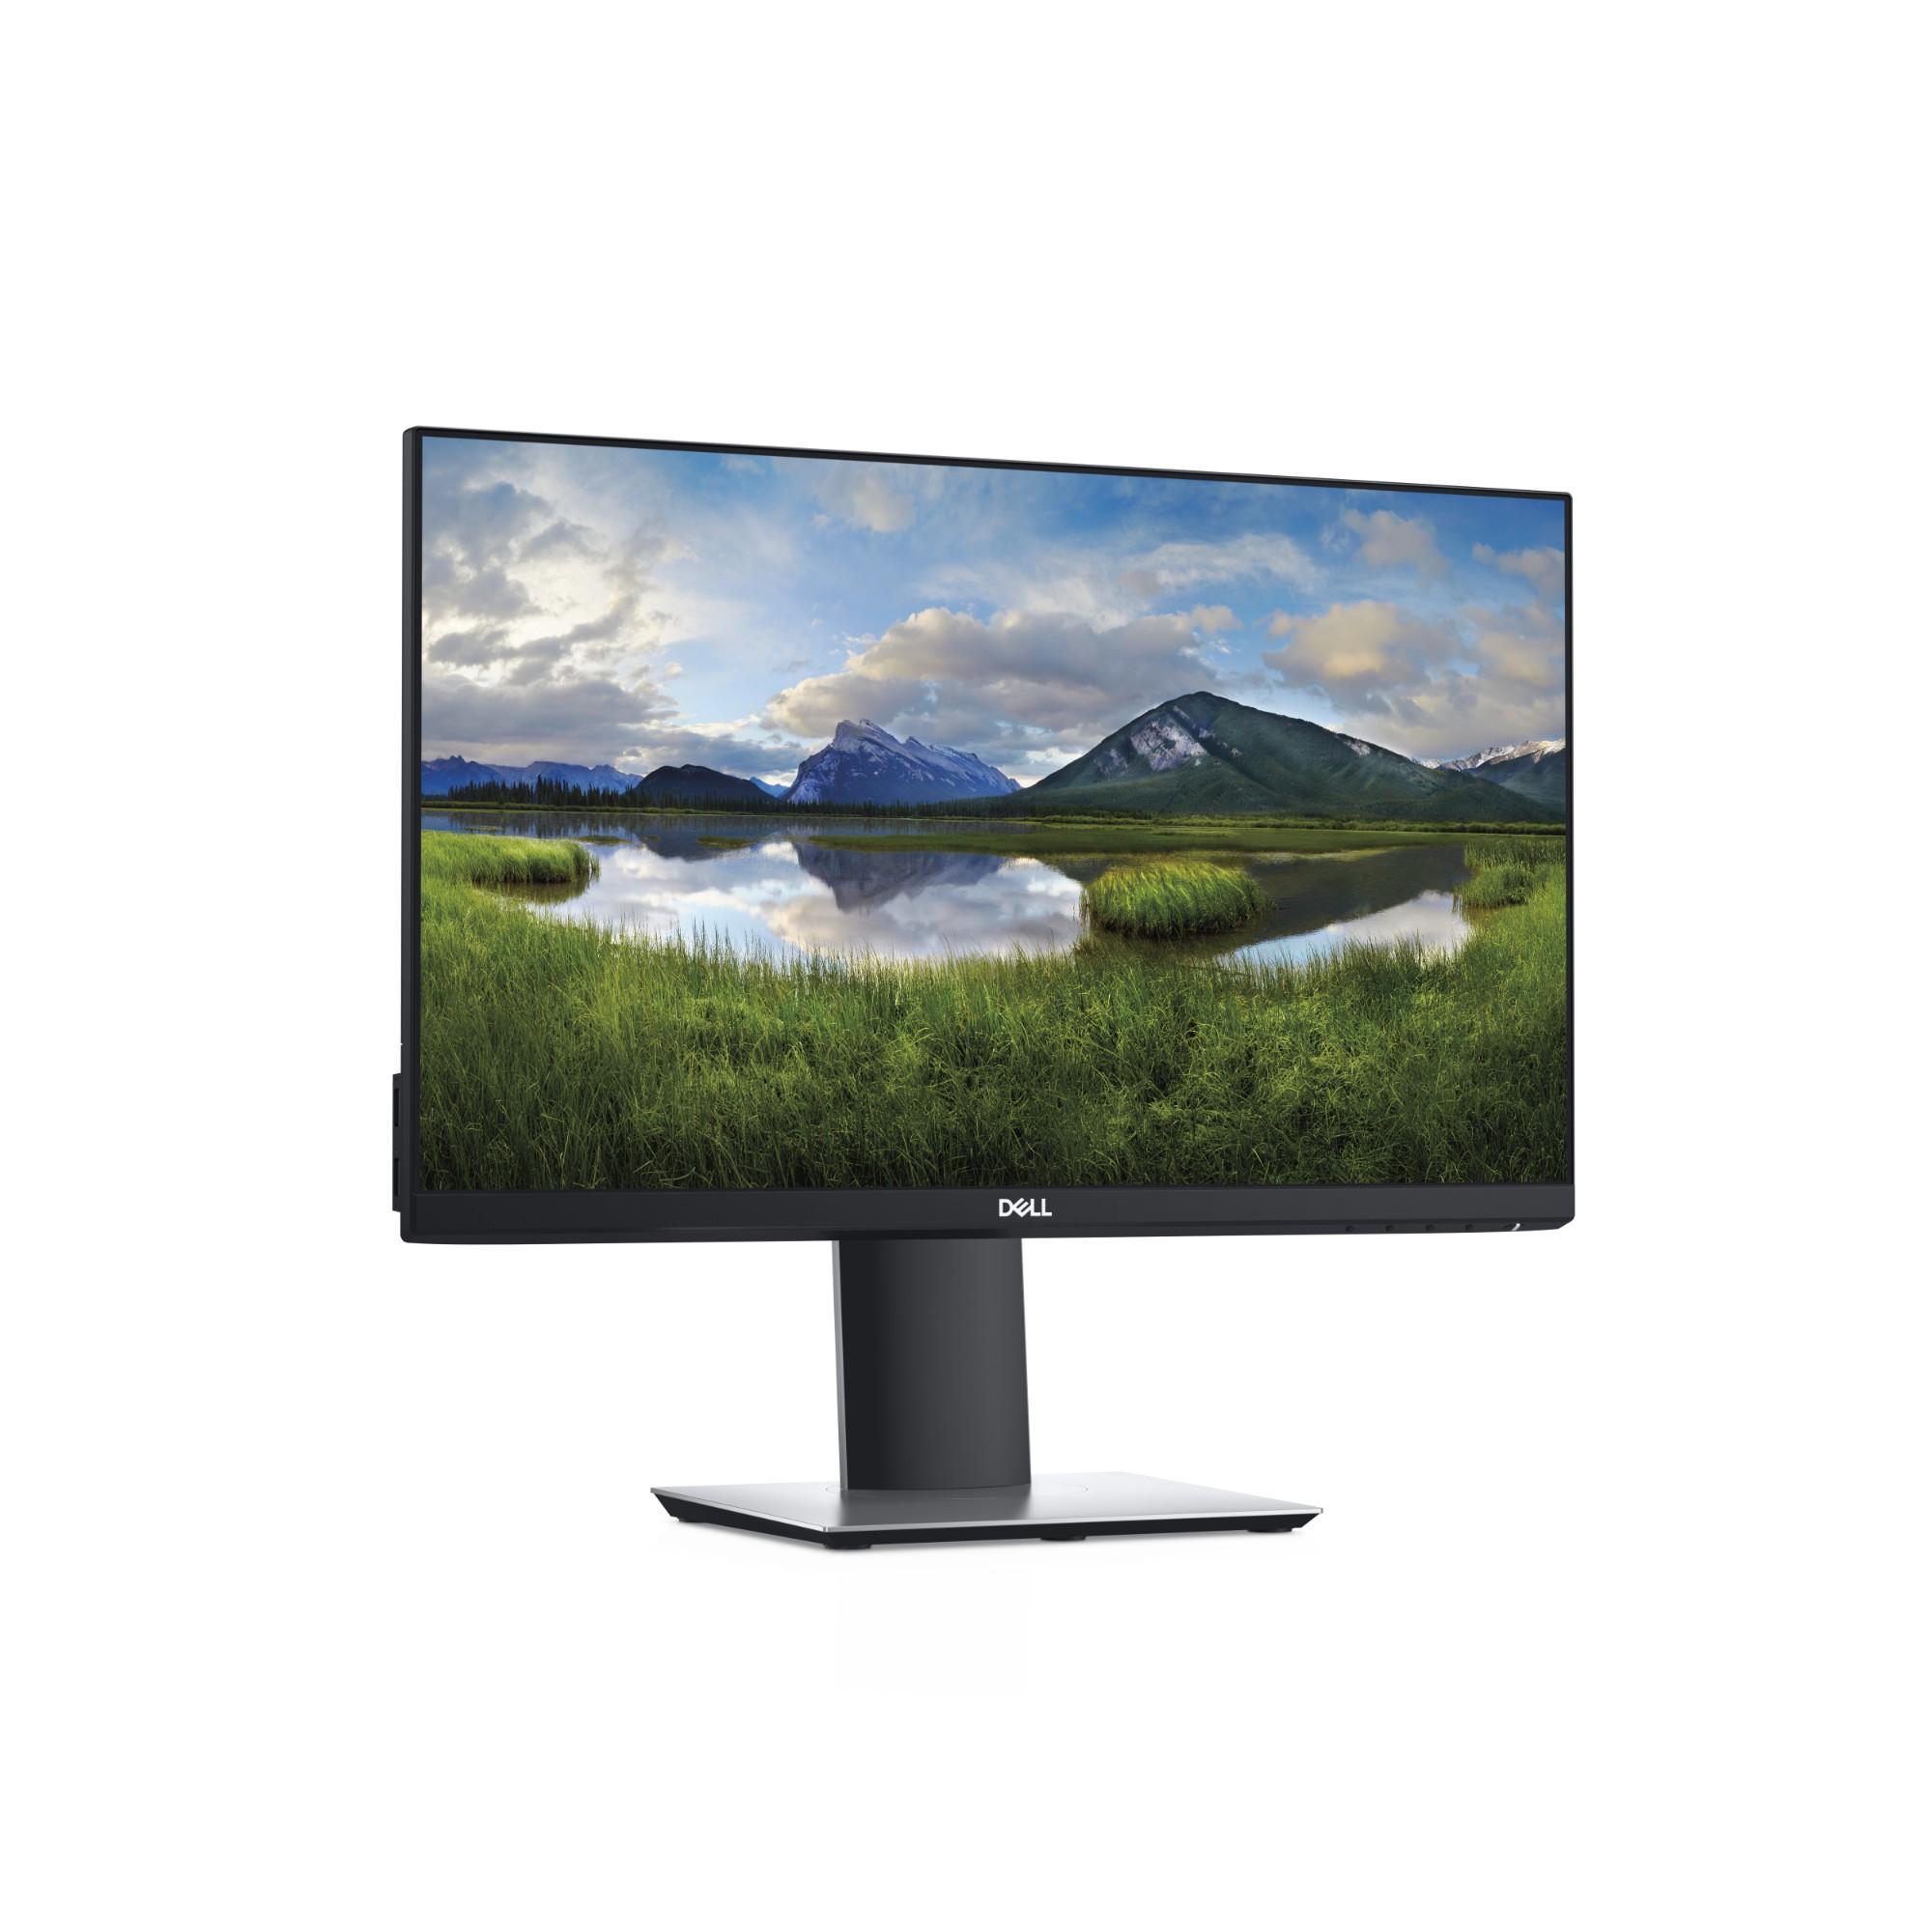 "DELL P2219H computer monitor 55.9 cm (22"") 1920 x 1080 pixels Full HD LED Black"